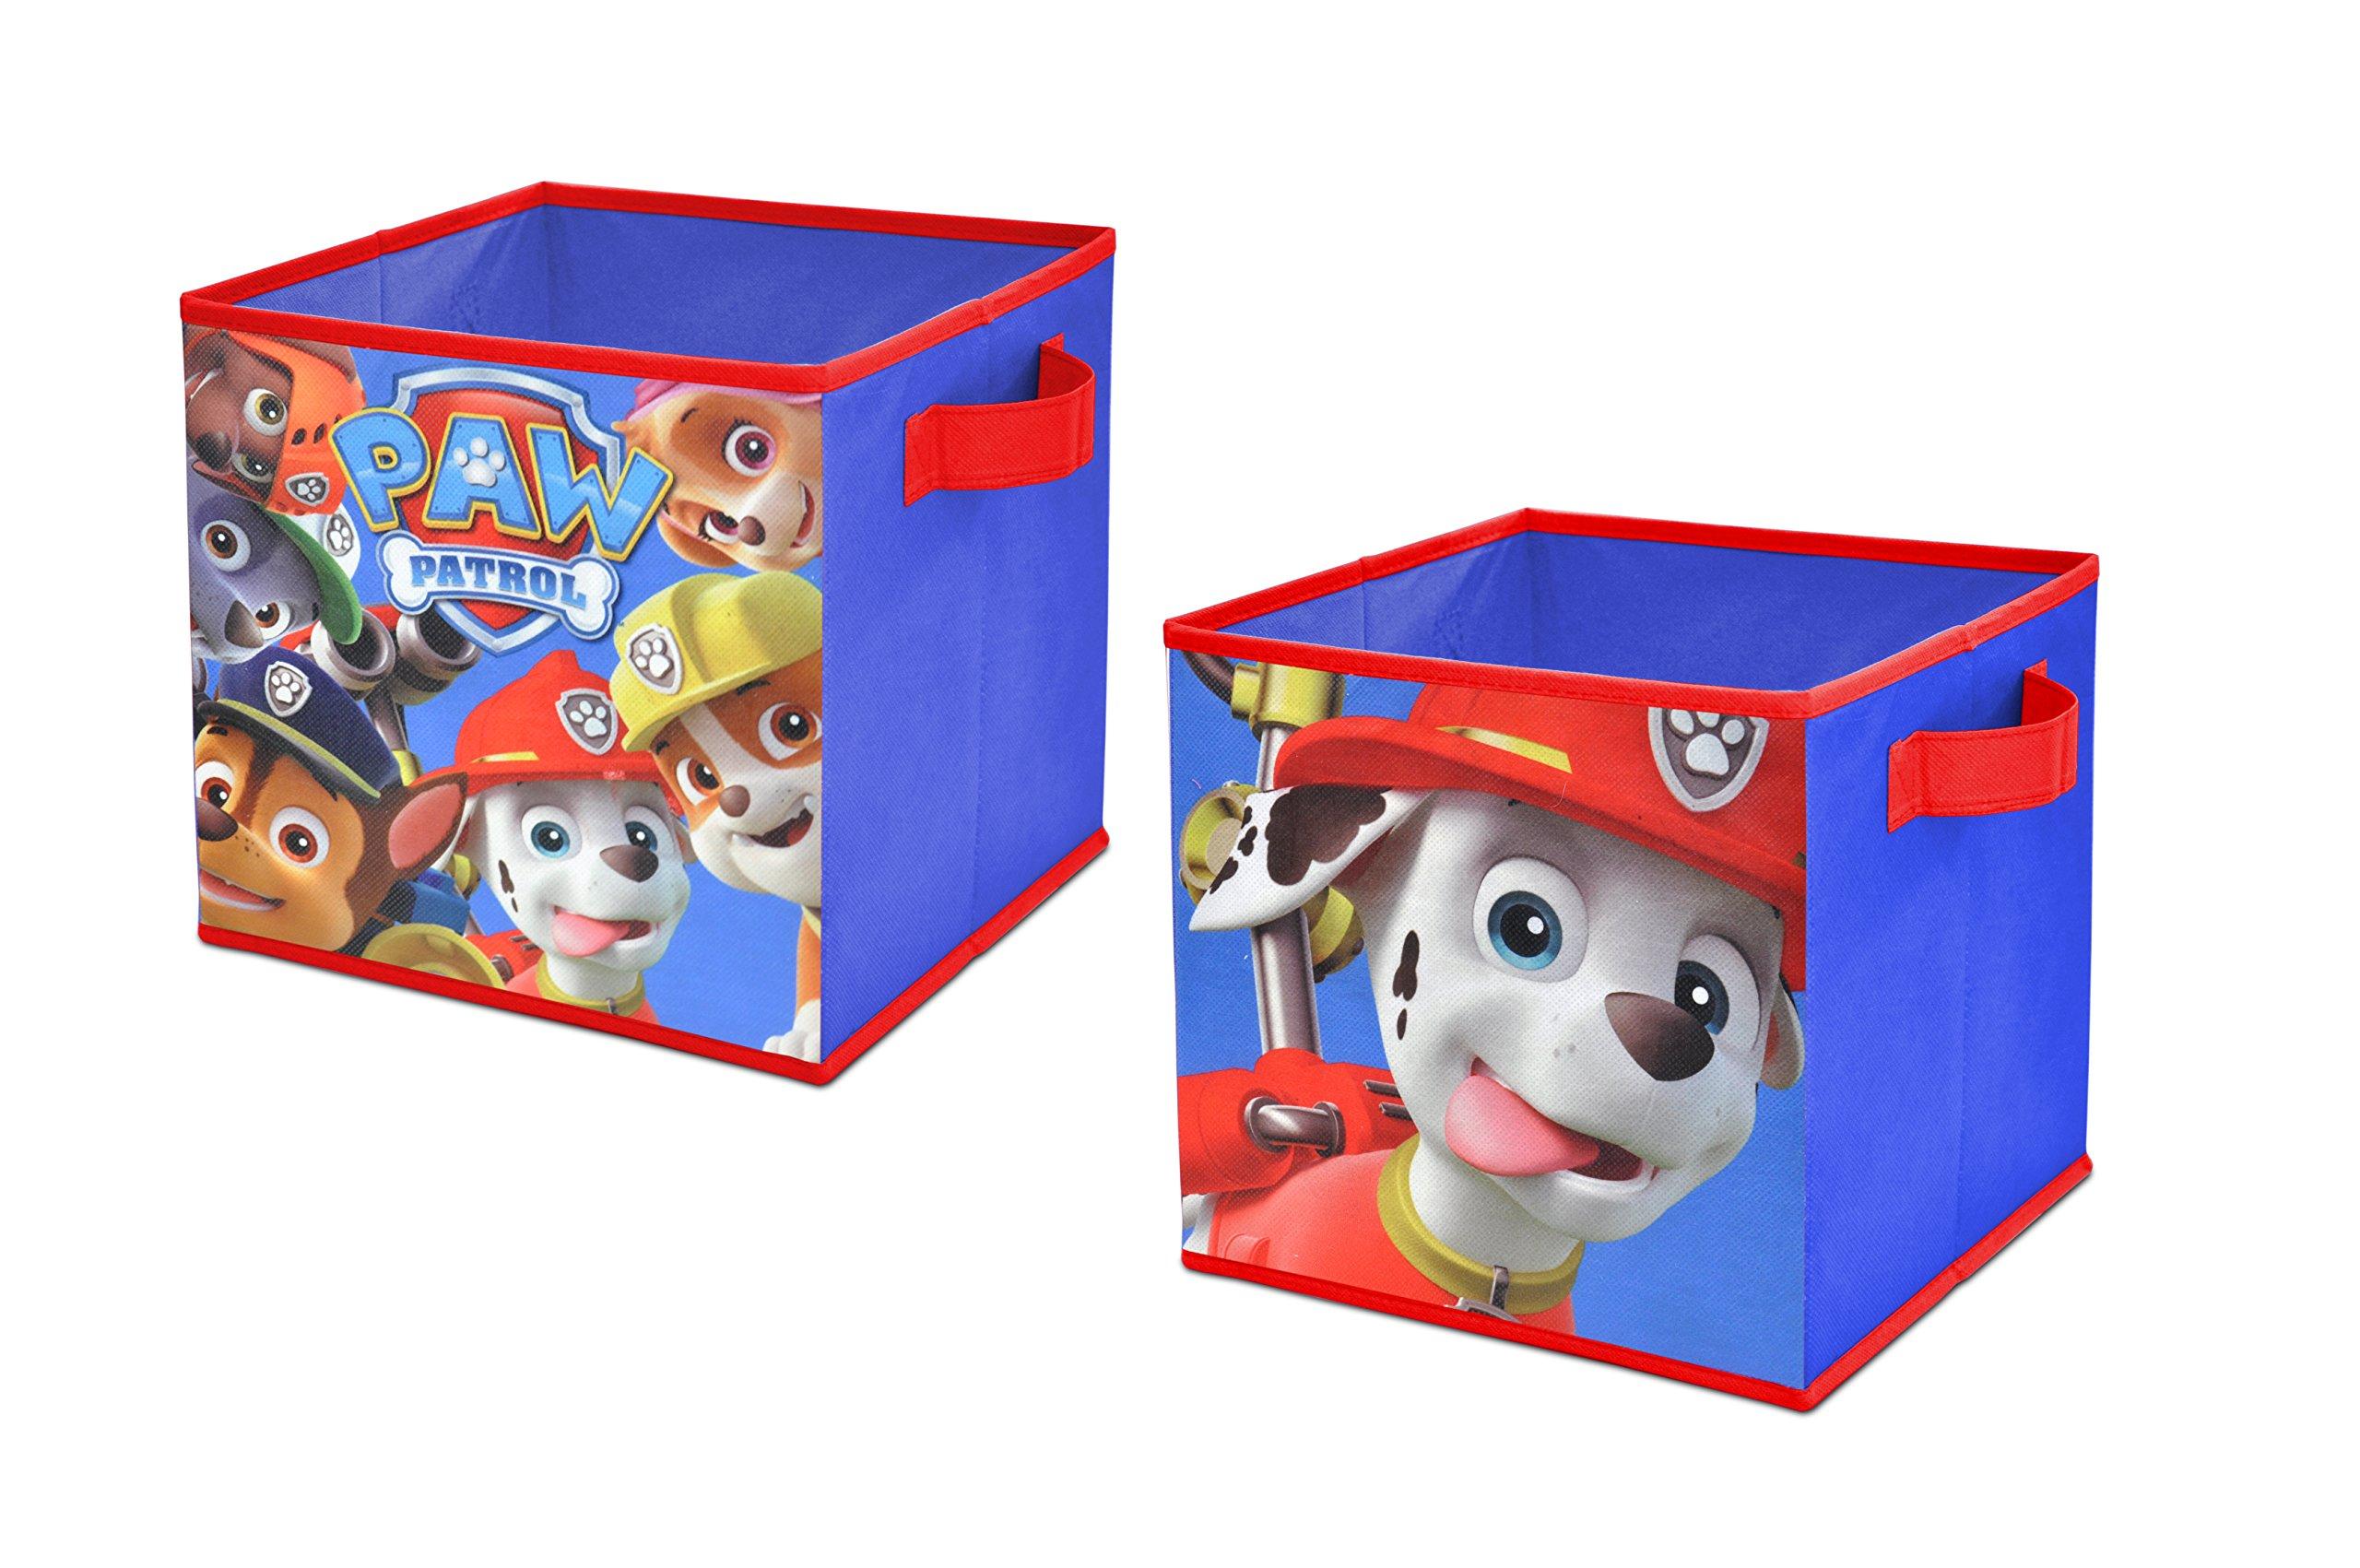 Nickelodeon Paw Patrol Storage Cubes (2 Pack), 10'' Toy